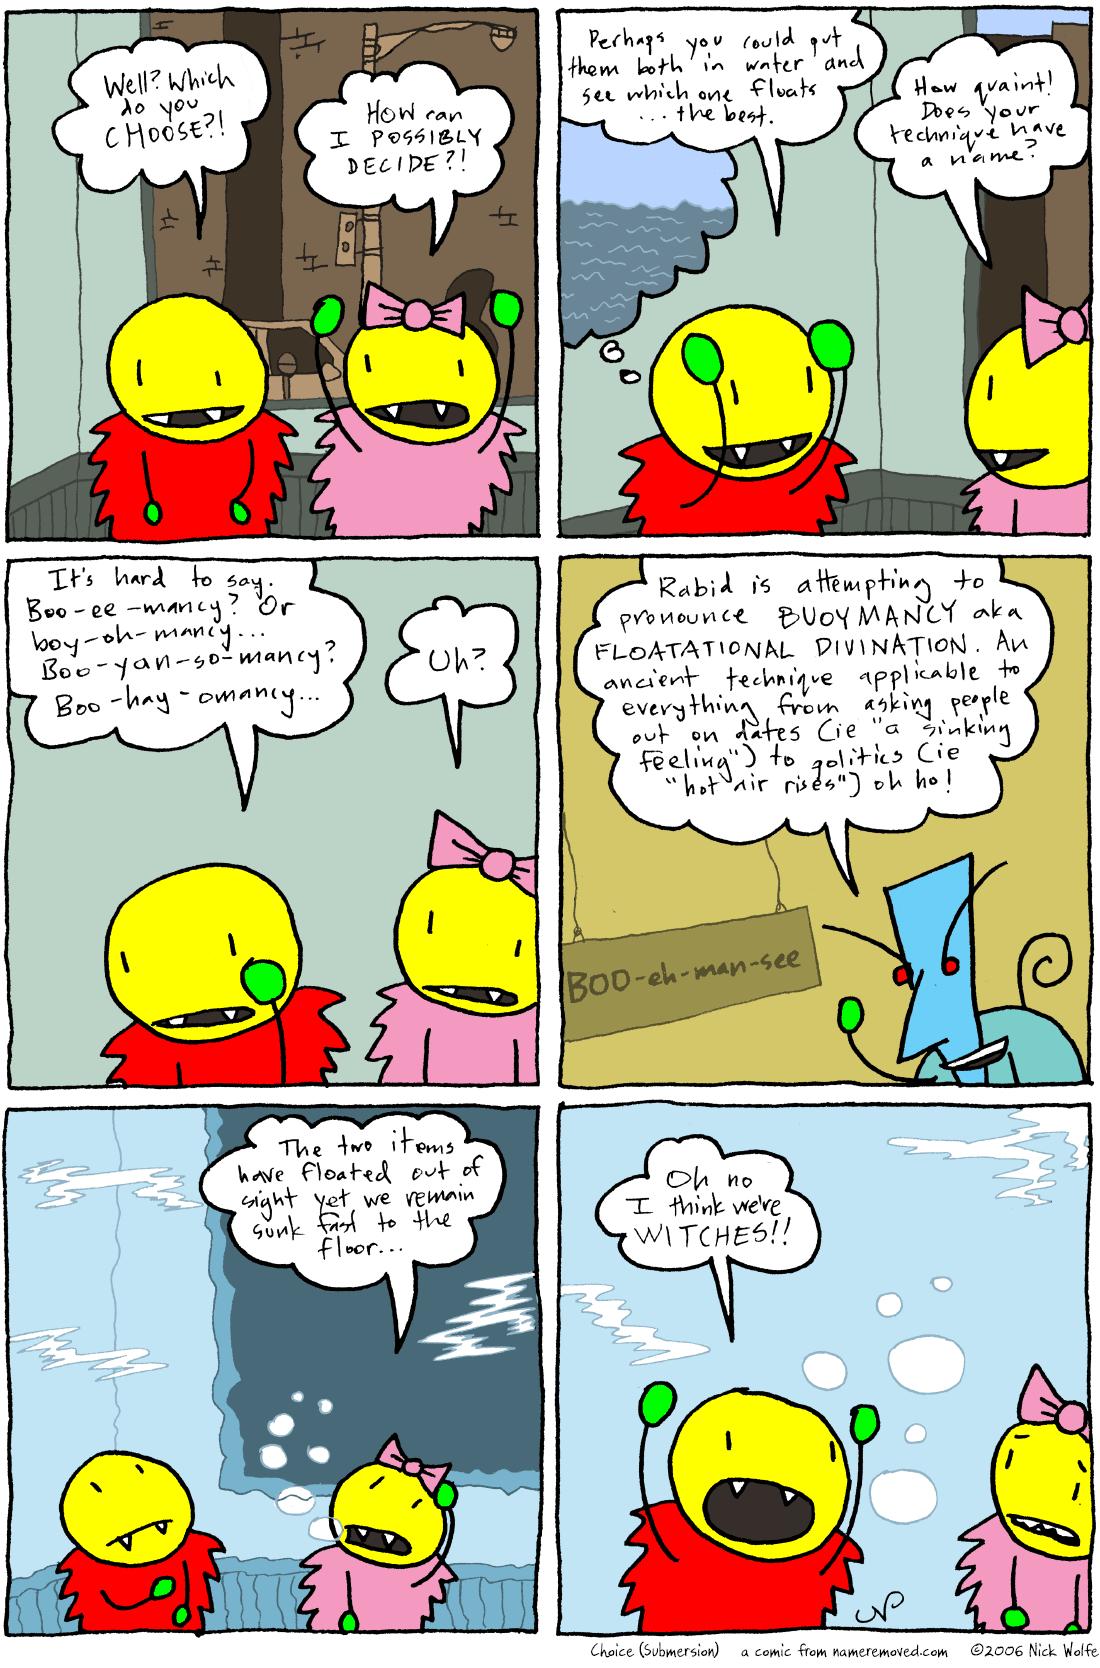 Choice (Submersion)